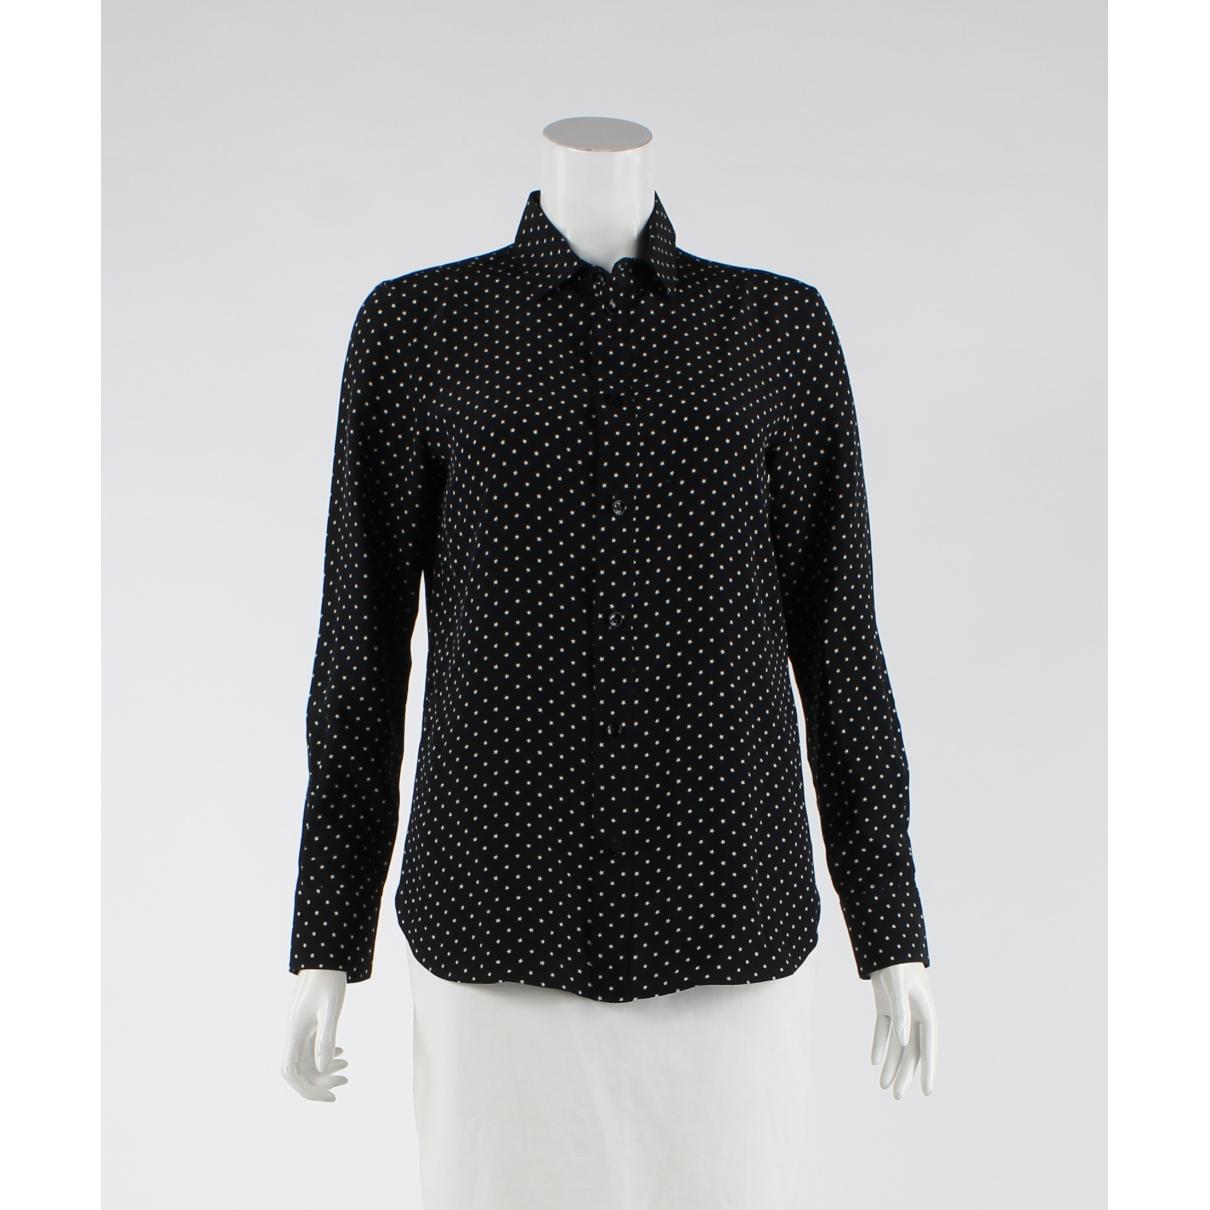 Saint Laurent N Black Silk  top for Women 36 FR